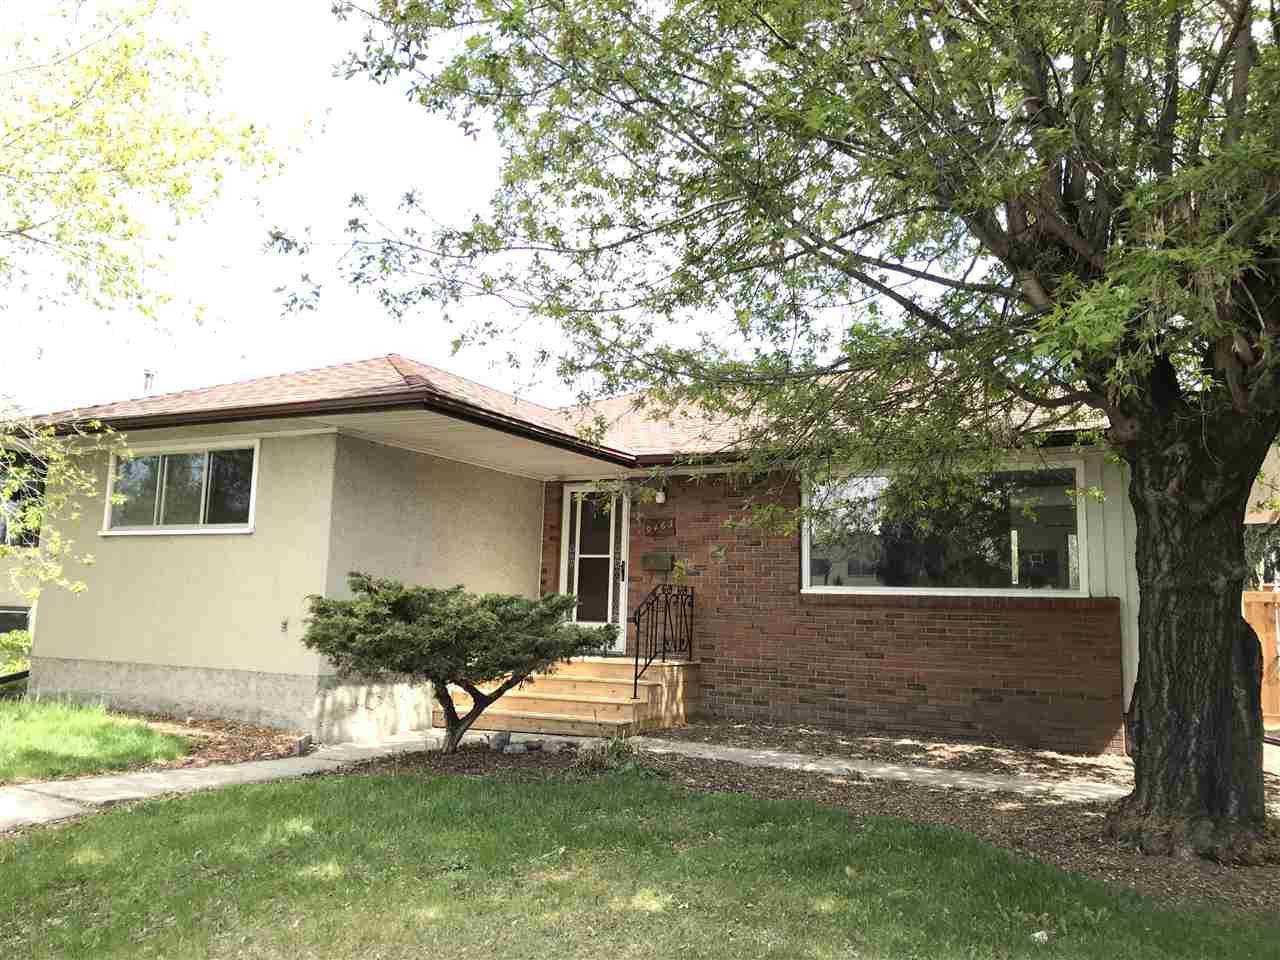 Main Photo: 9463 75 Street in Edmonton: Zone 18 House for sale : MLS®# E4157470